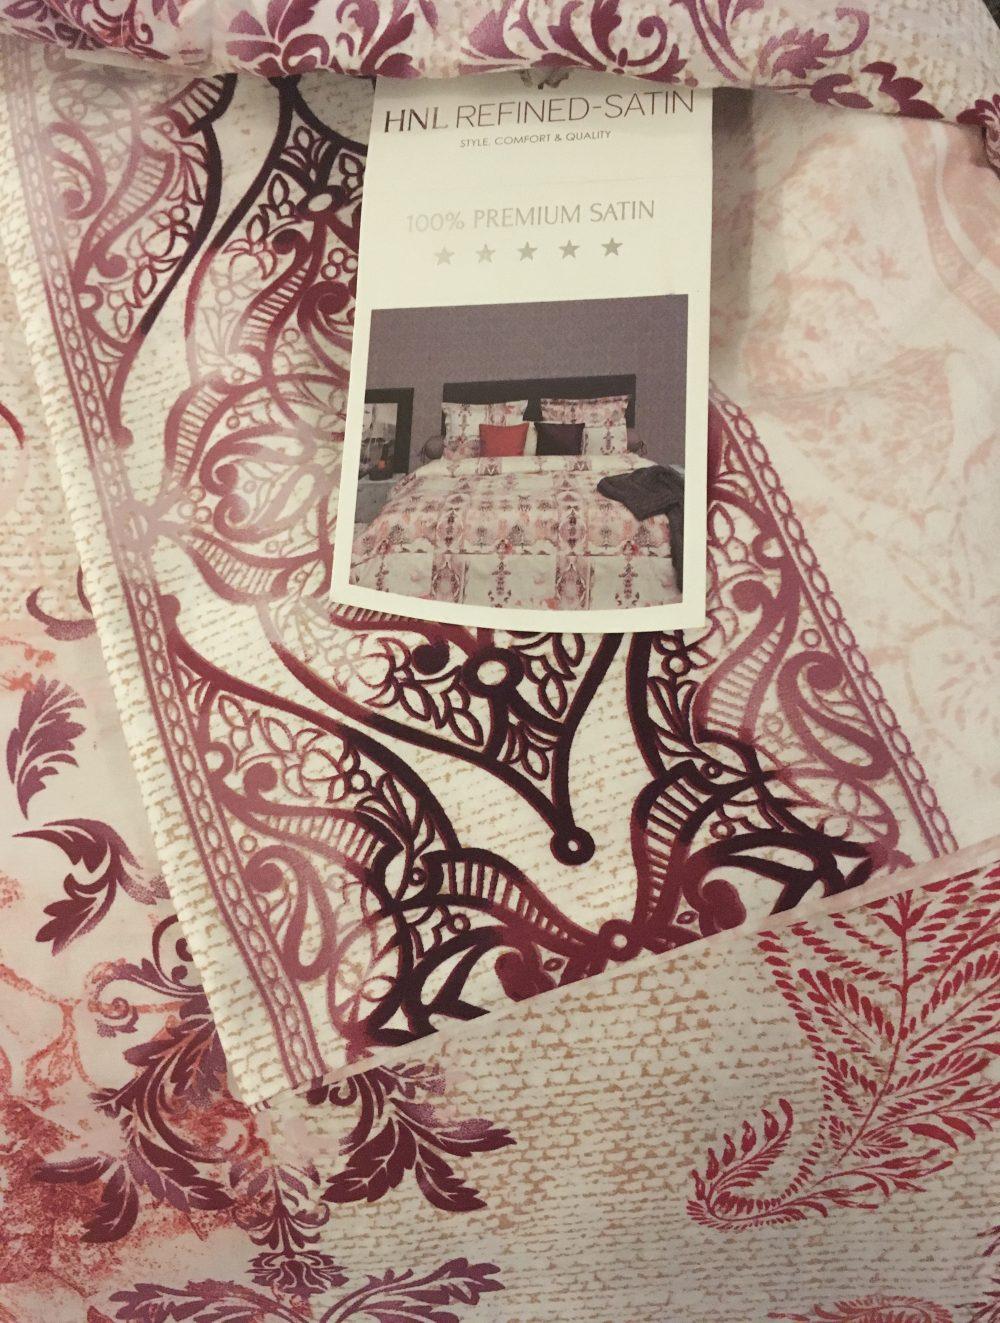 retro-bed-time-oriental-print-duvet-cover